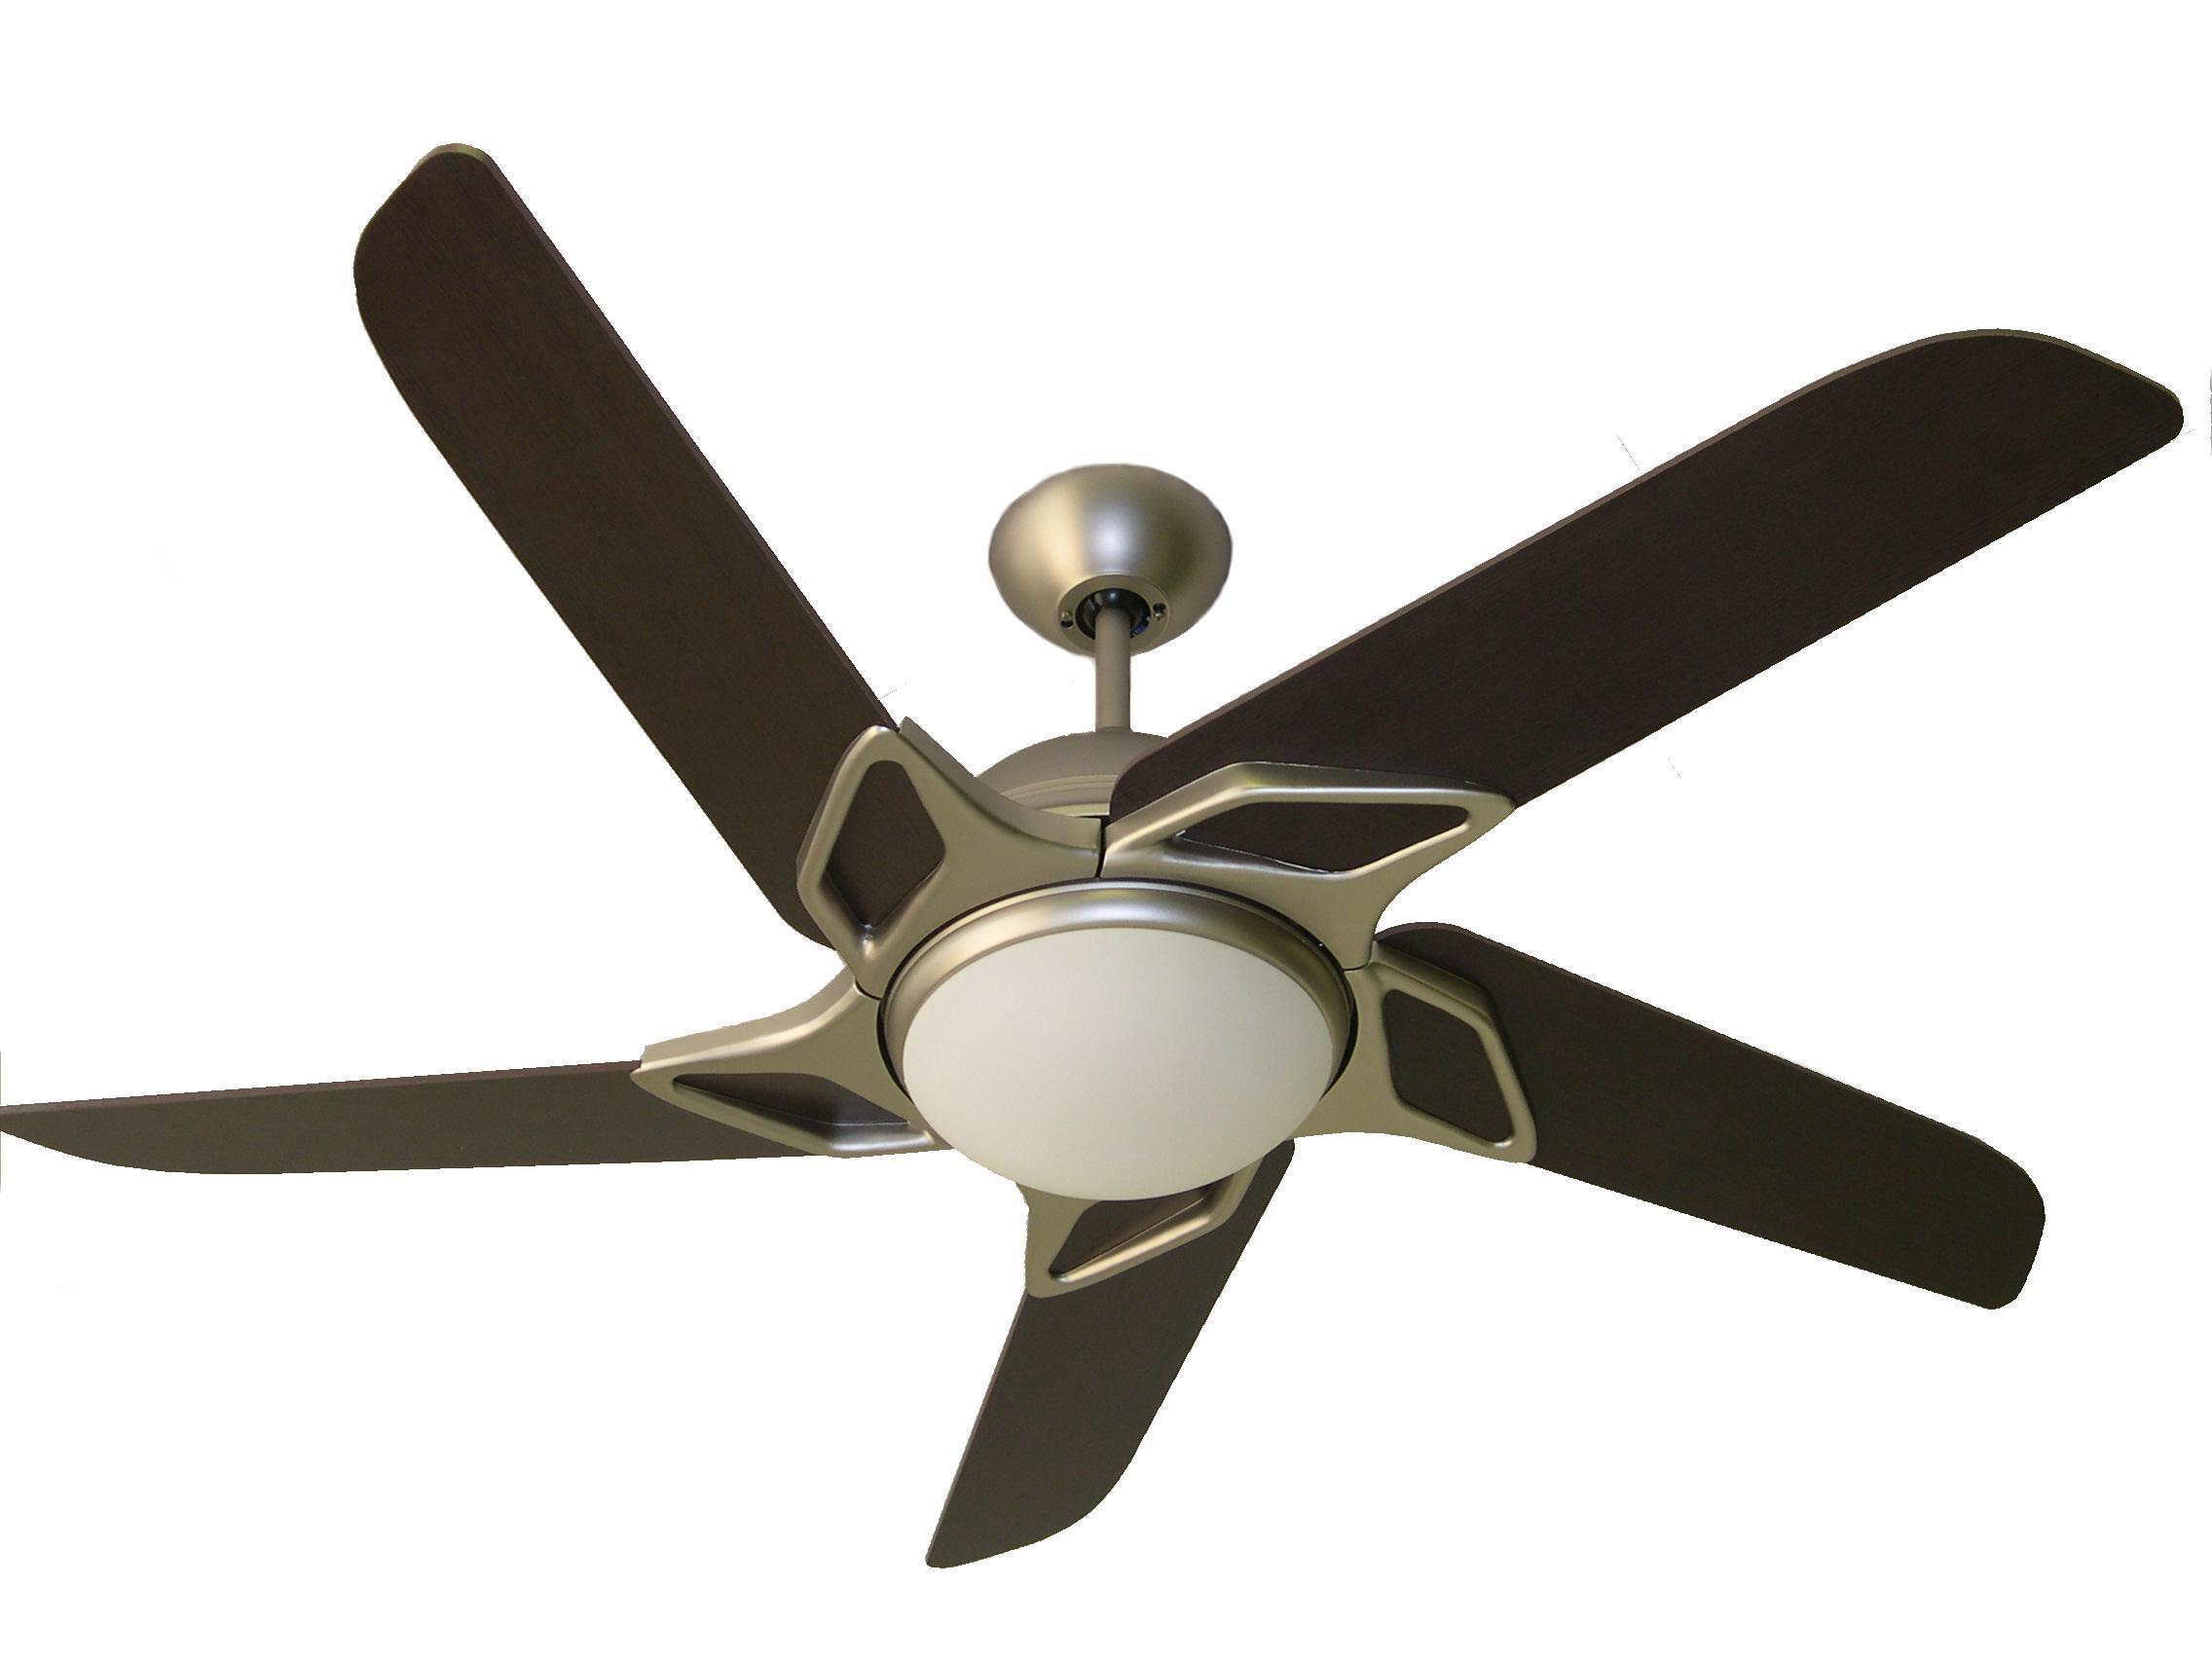 cool-ceiling-fans-Ceiling-Fans-172.jpg